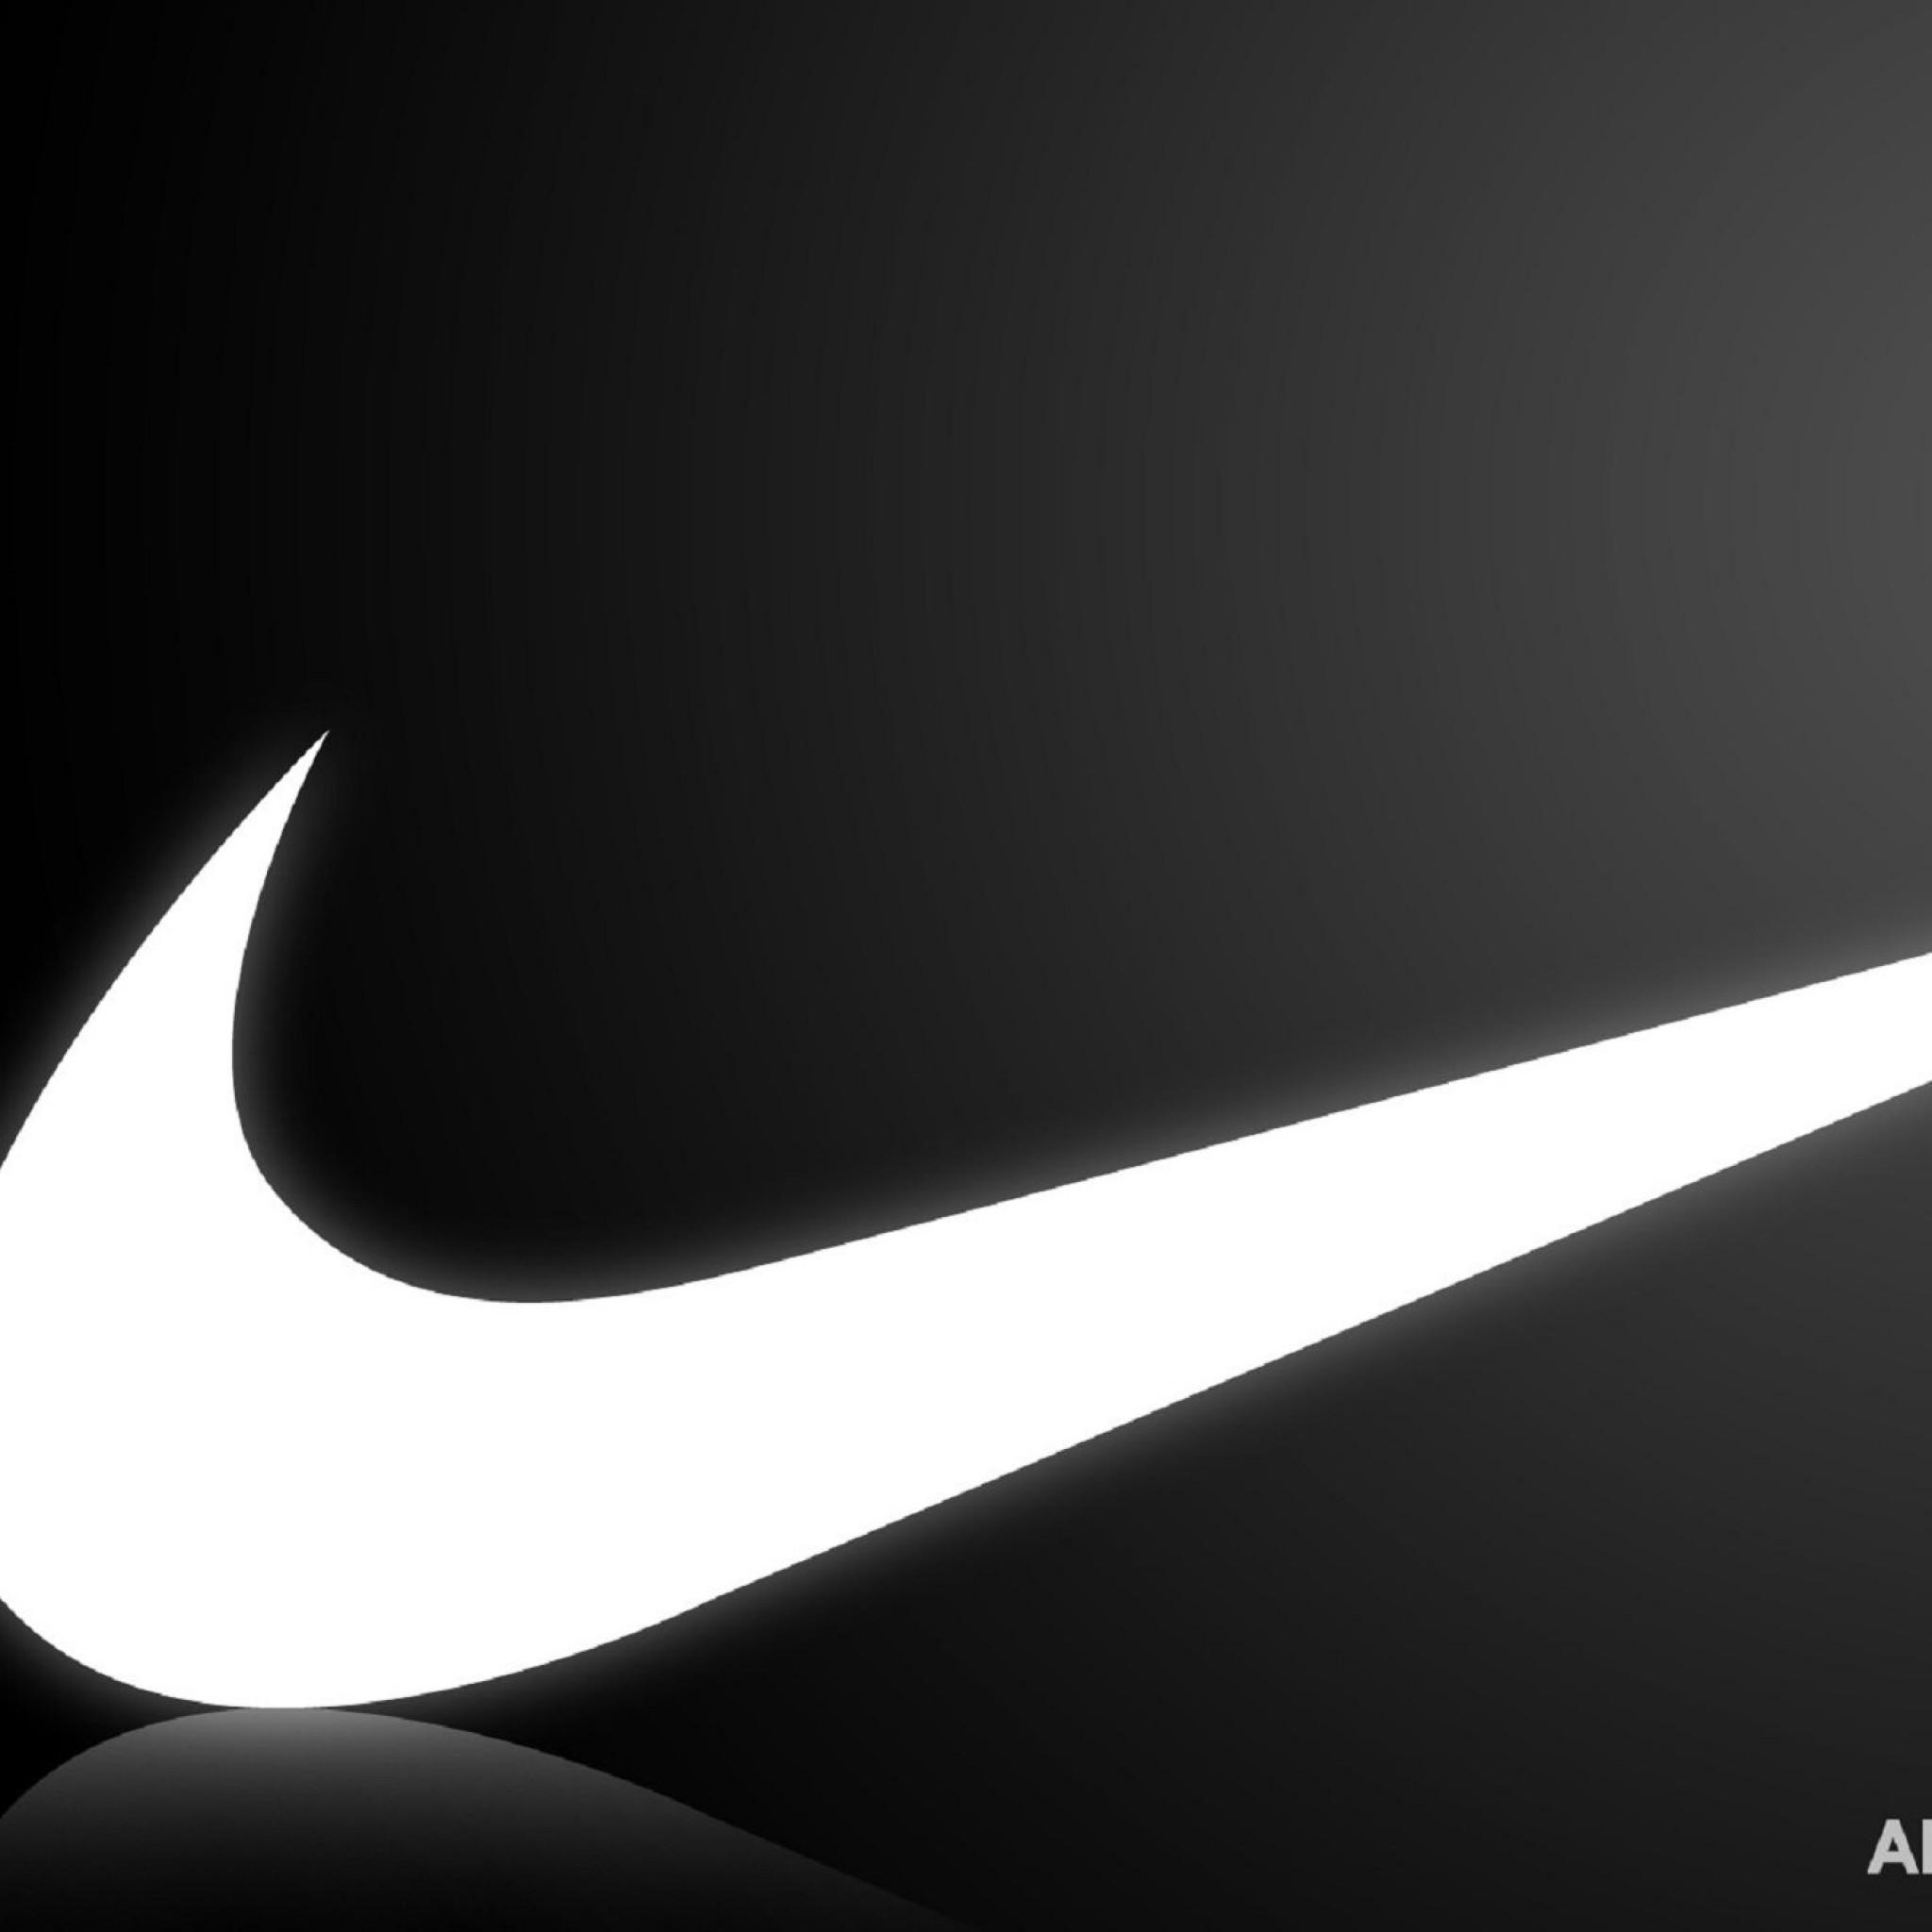 Nike Iphone Wallpapers iPad Wallpaper Gallery 2048x2048